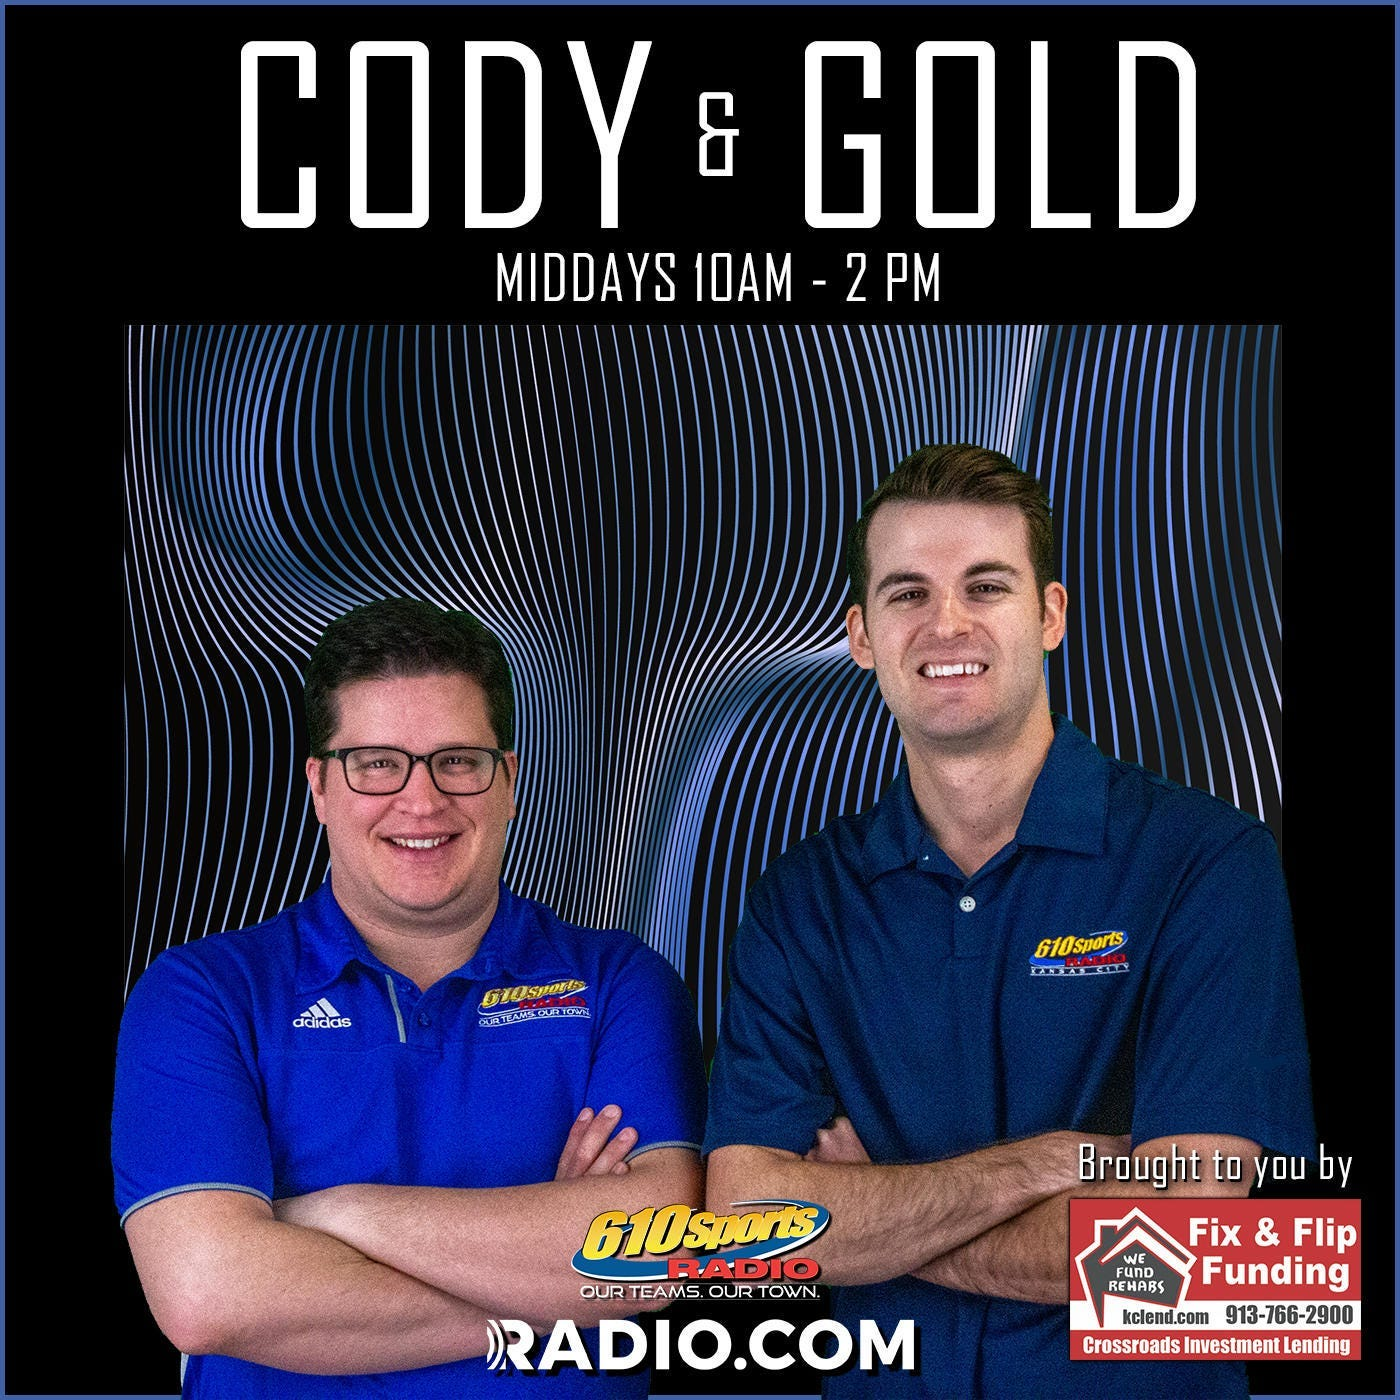 Cody & Gold